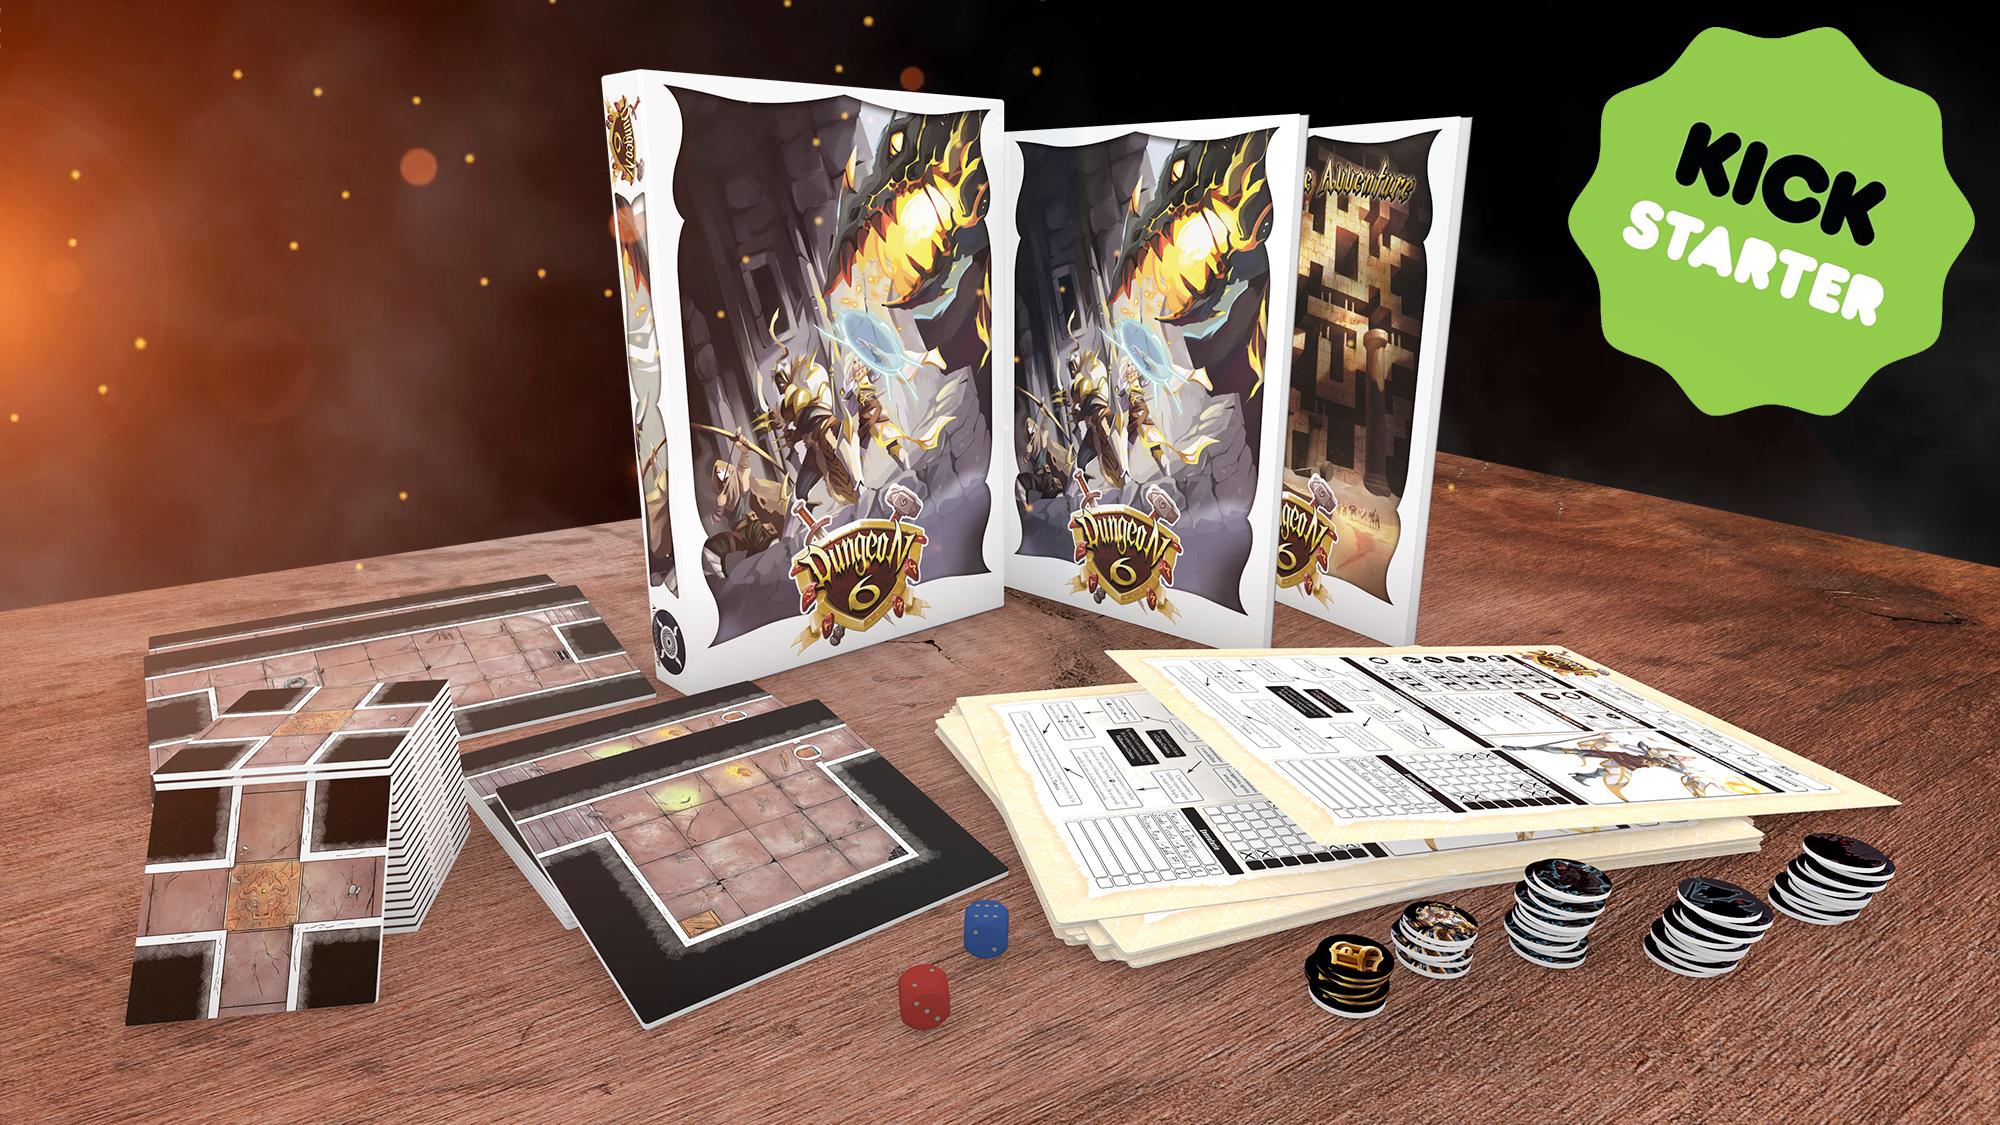 Dungeon 6: un Gioco di Dungeon Modulari, ora su Kickstarter